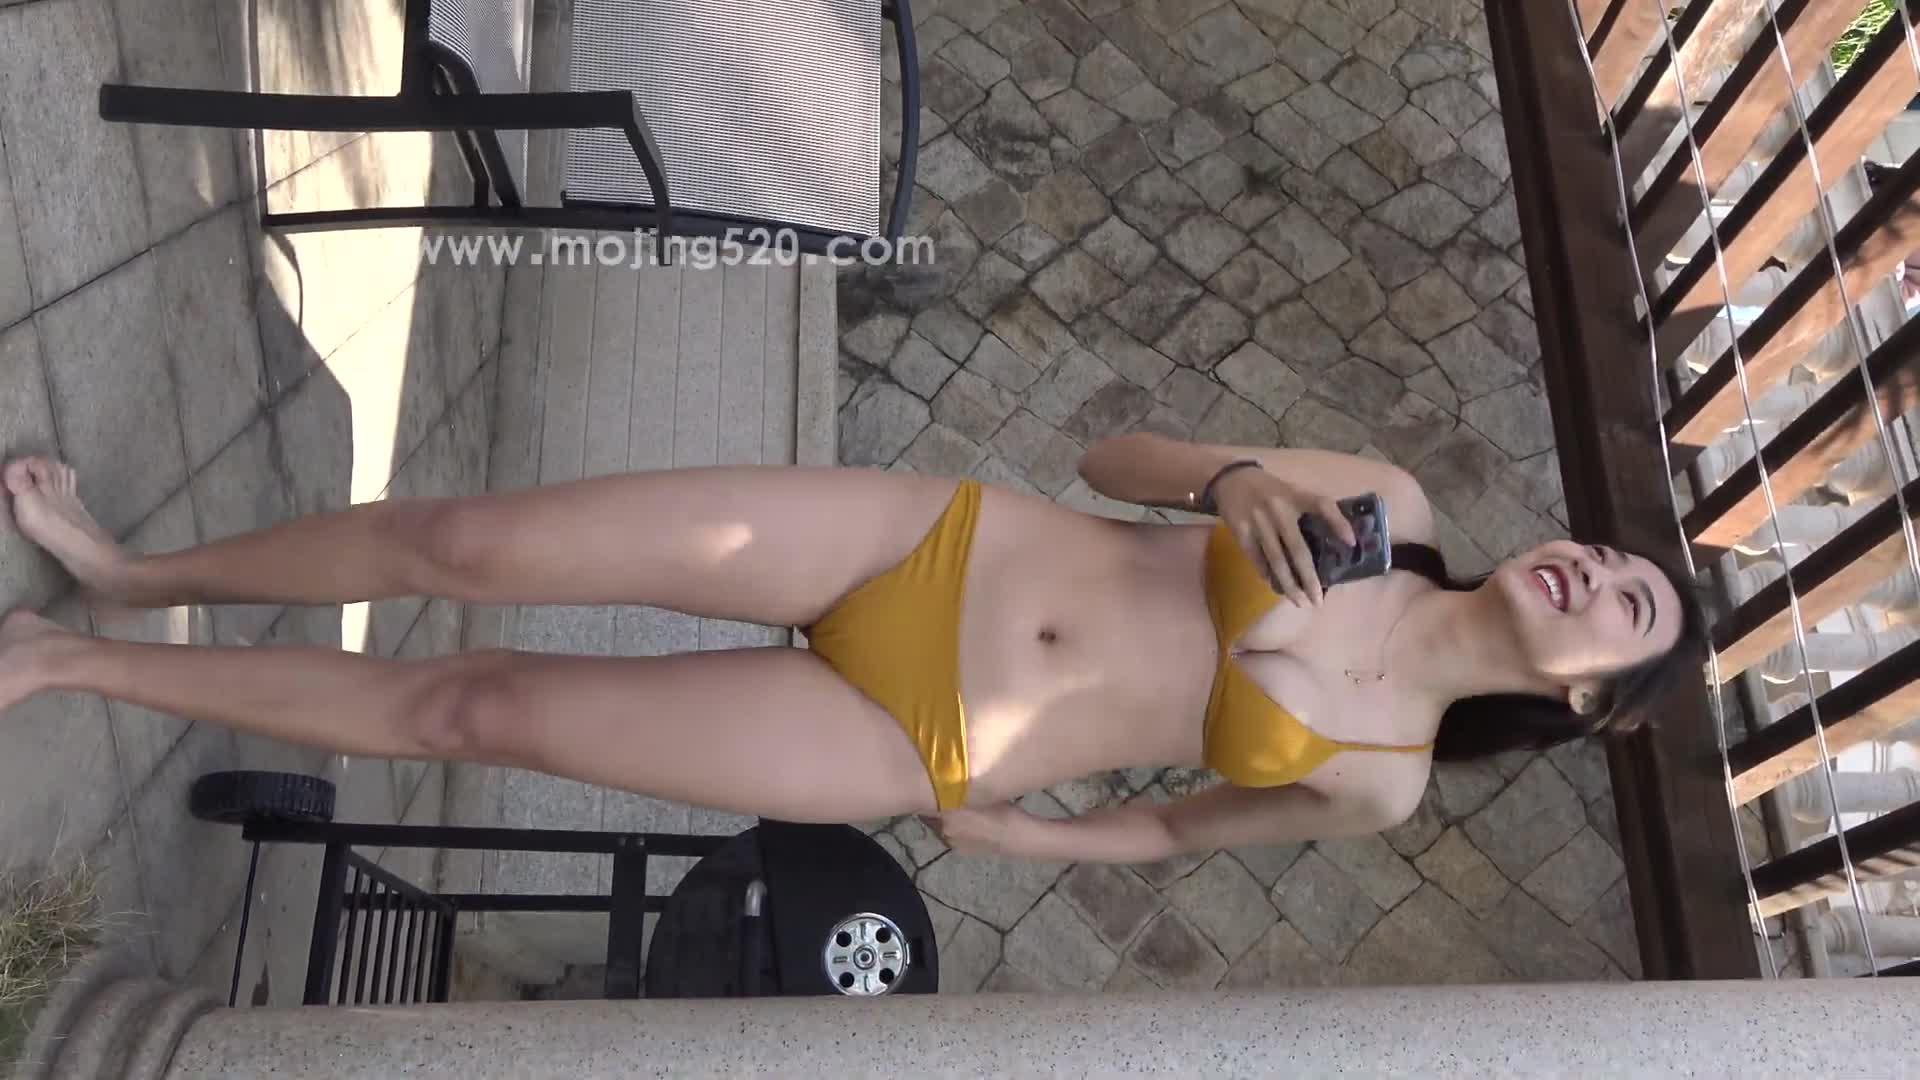 4K 黄色比基尼性感小姐姐 1 Sexy Yellow Bikini Swimsuit Beauty